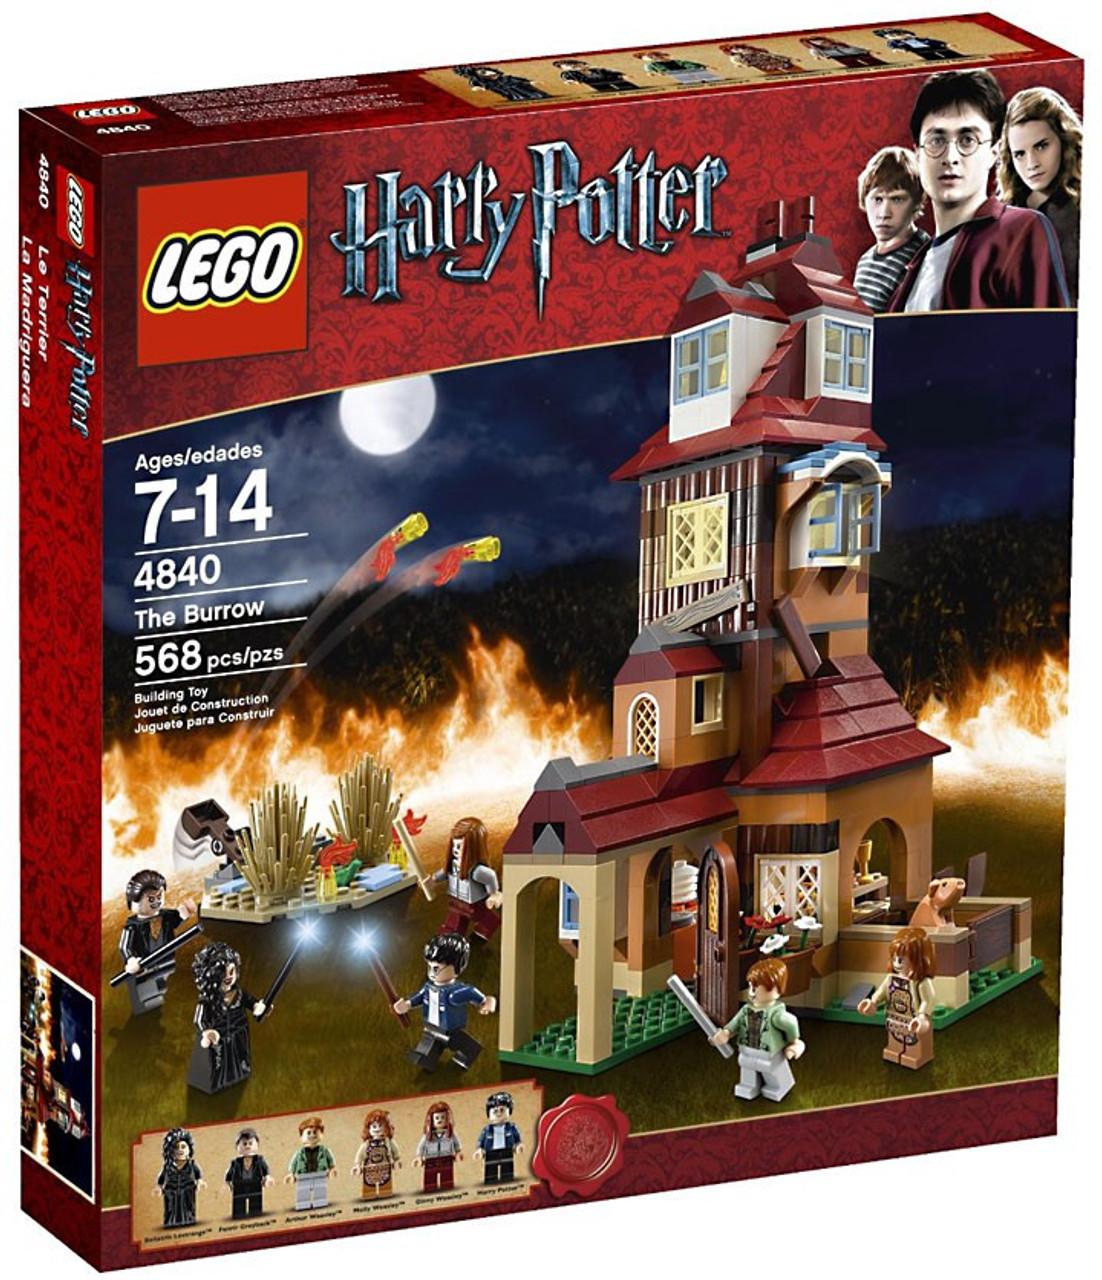 LEGO Harry Potter Series 2 The Burrow Set #4840